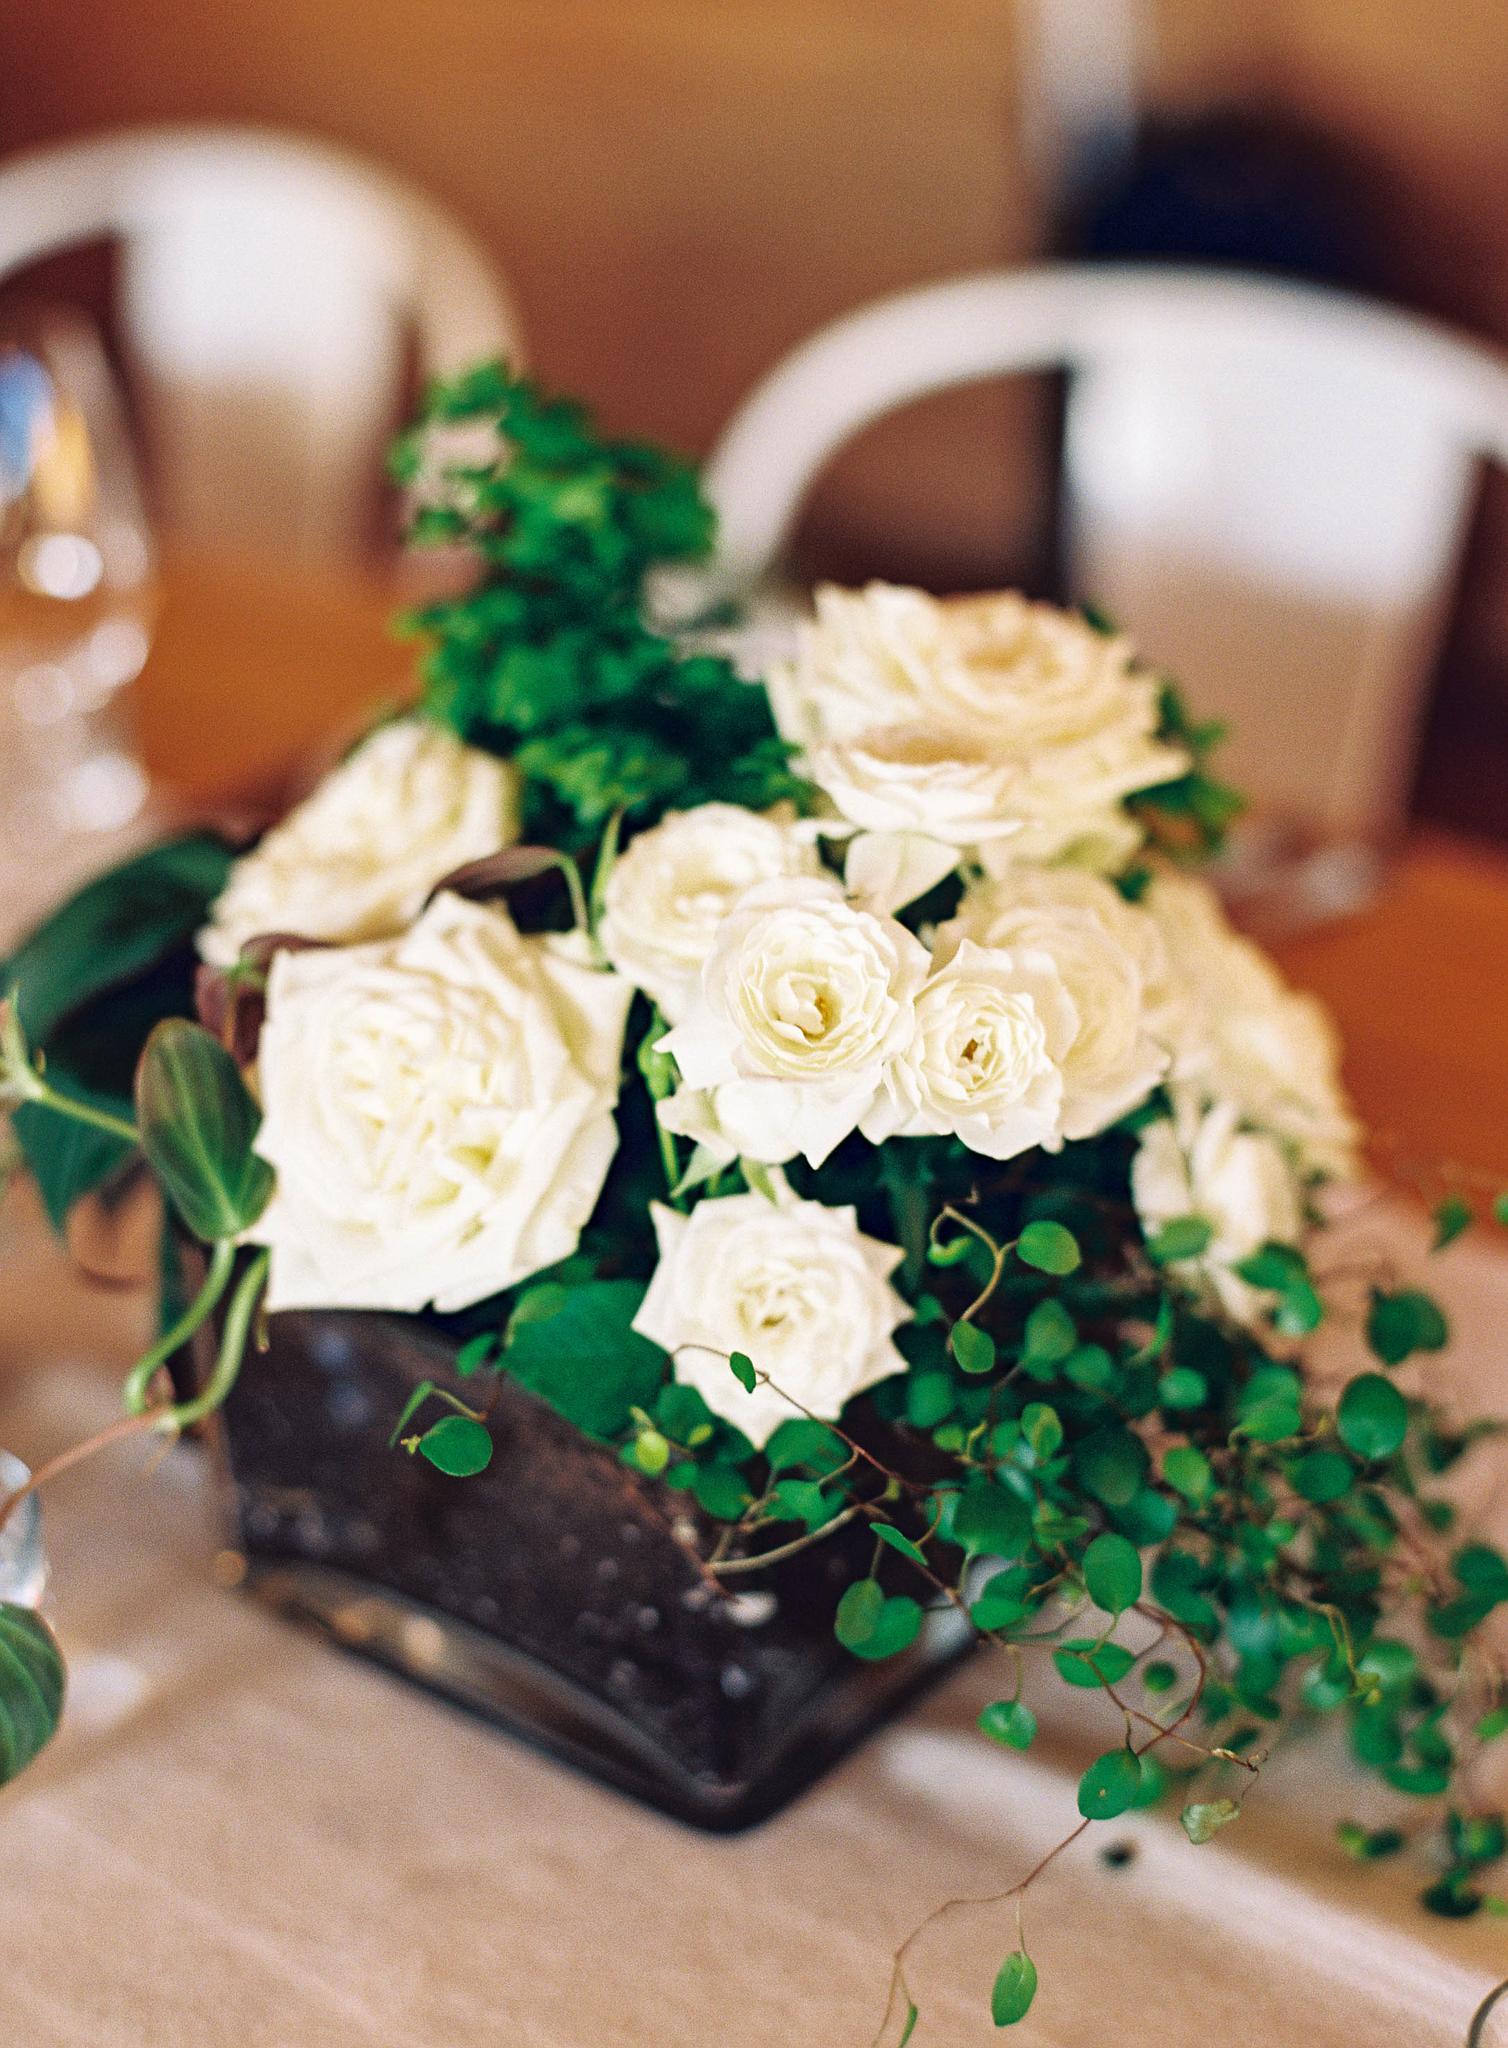 Meghan Mehan Photography - Fine Art Film Wedding Photography - San Francisco   Napa   Sonoma   Big Sur   Chicago   Minneapolis   Milwaukee   Lake Geneva   Door County   Wisconsin 074.jpg